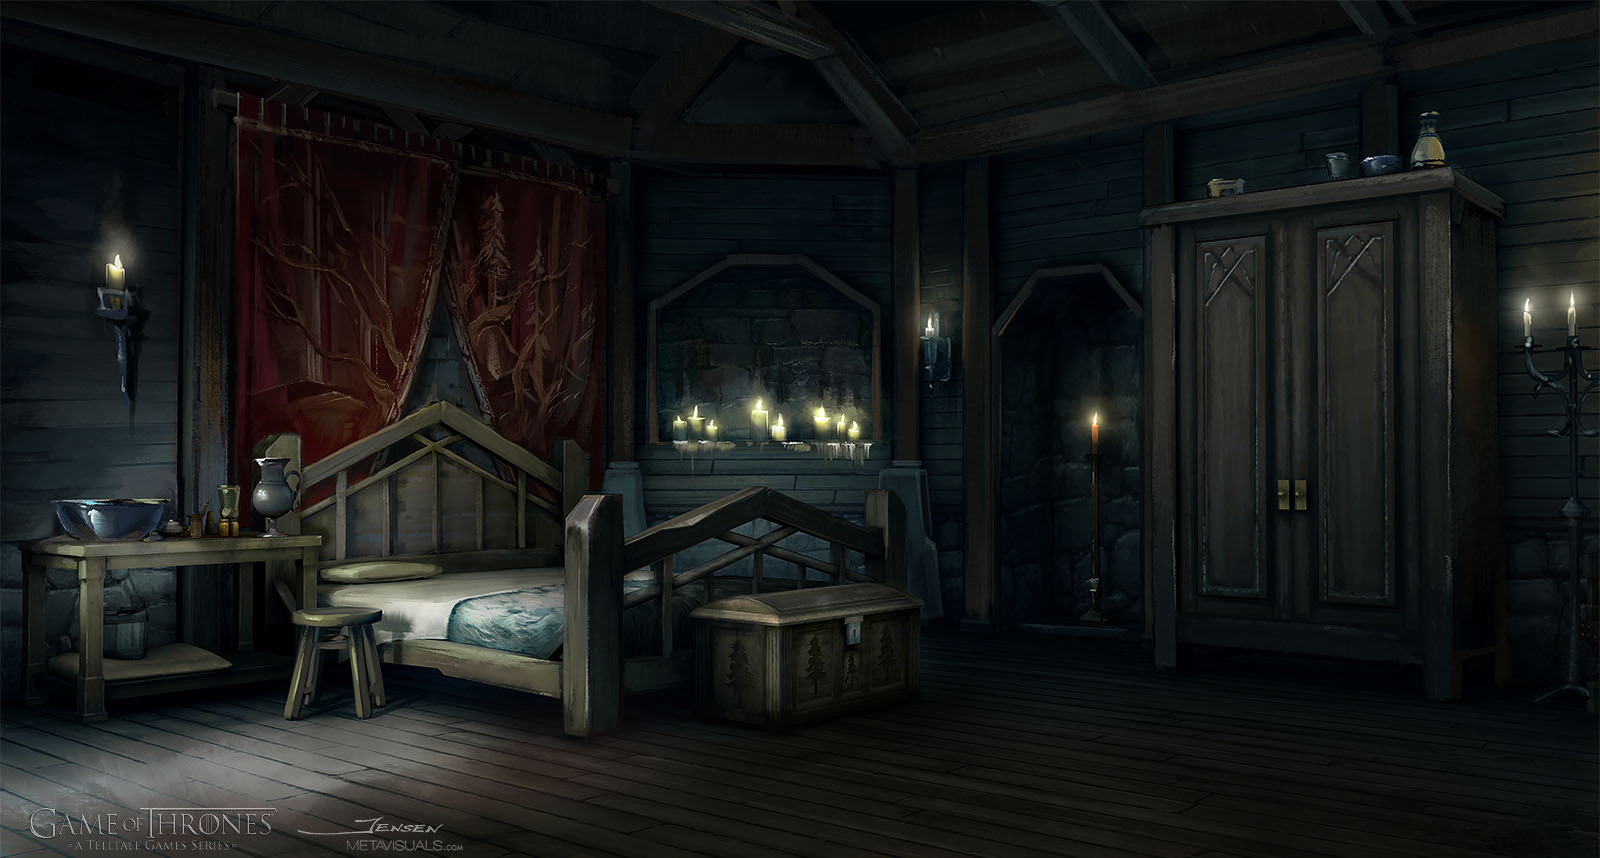 PatrickJensen_GameOfThrones_LordsChamber2.jpg